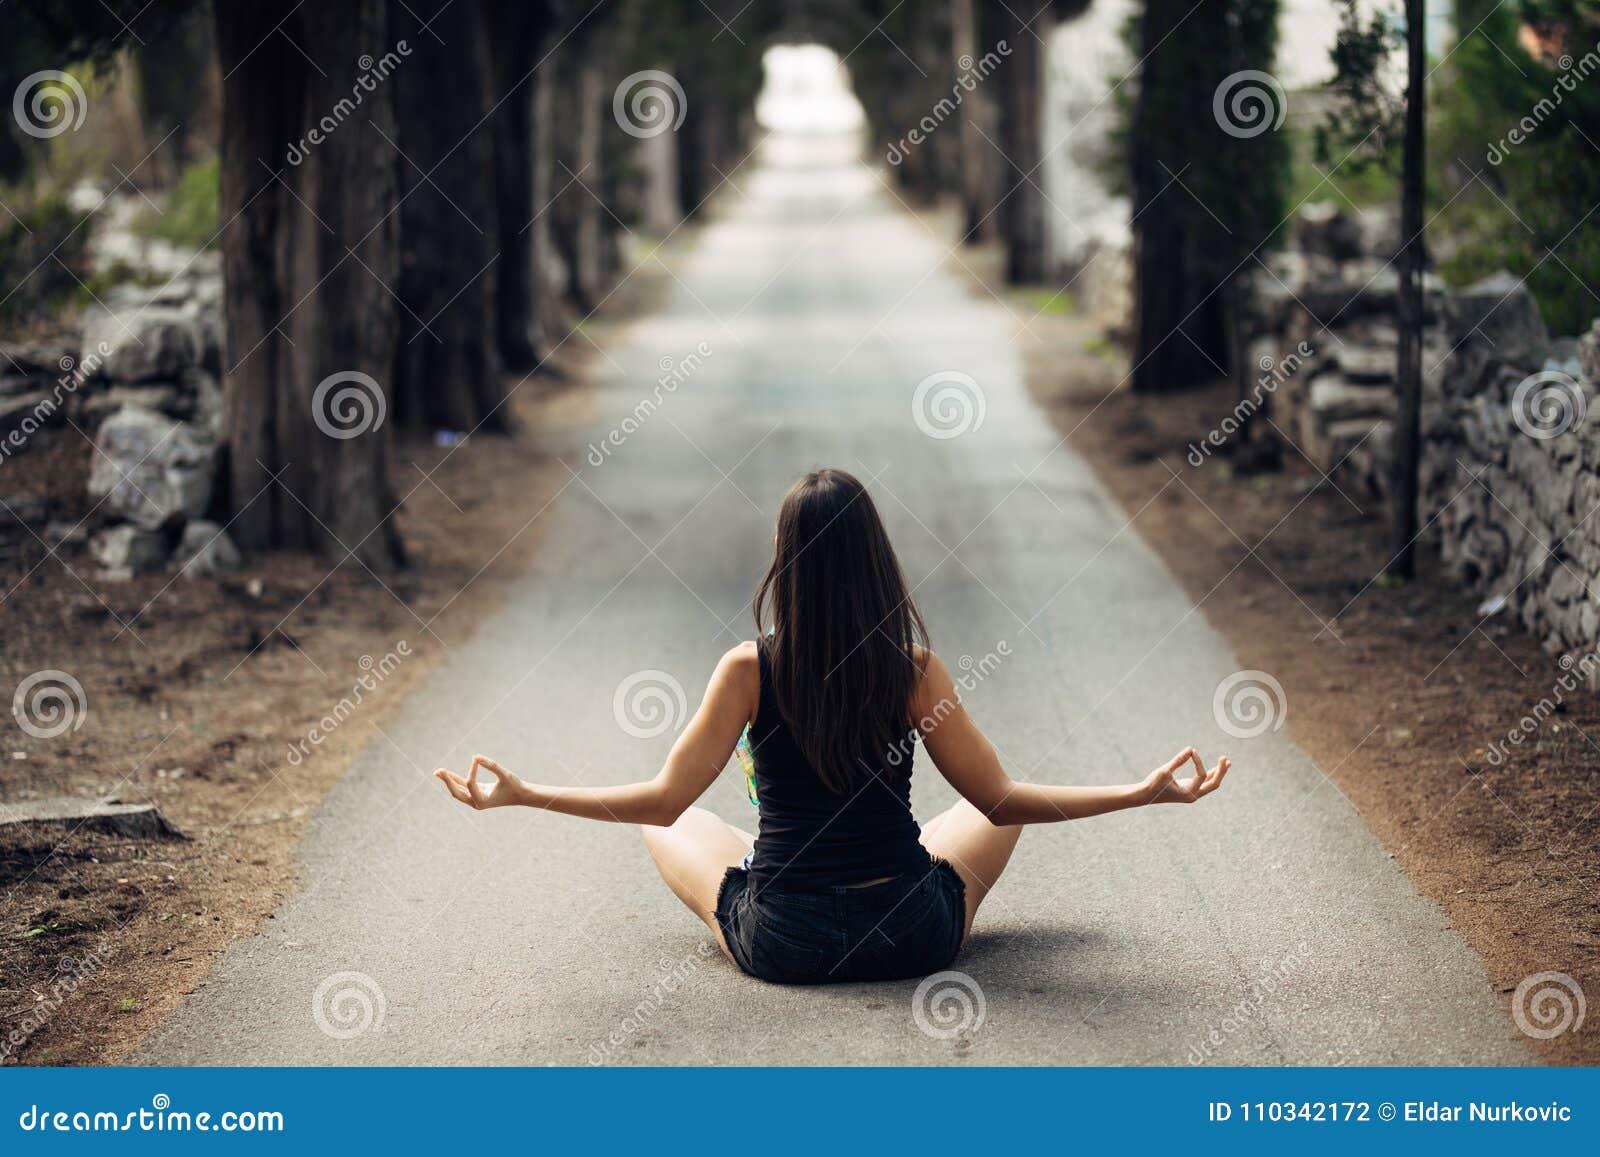 Carefree calm woman meditating in nature.Finding inner peace.Yoga practice.Spiritual healing lifestyle.Enjoying peace,anti-stress